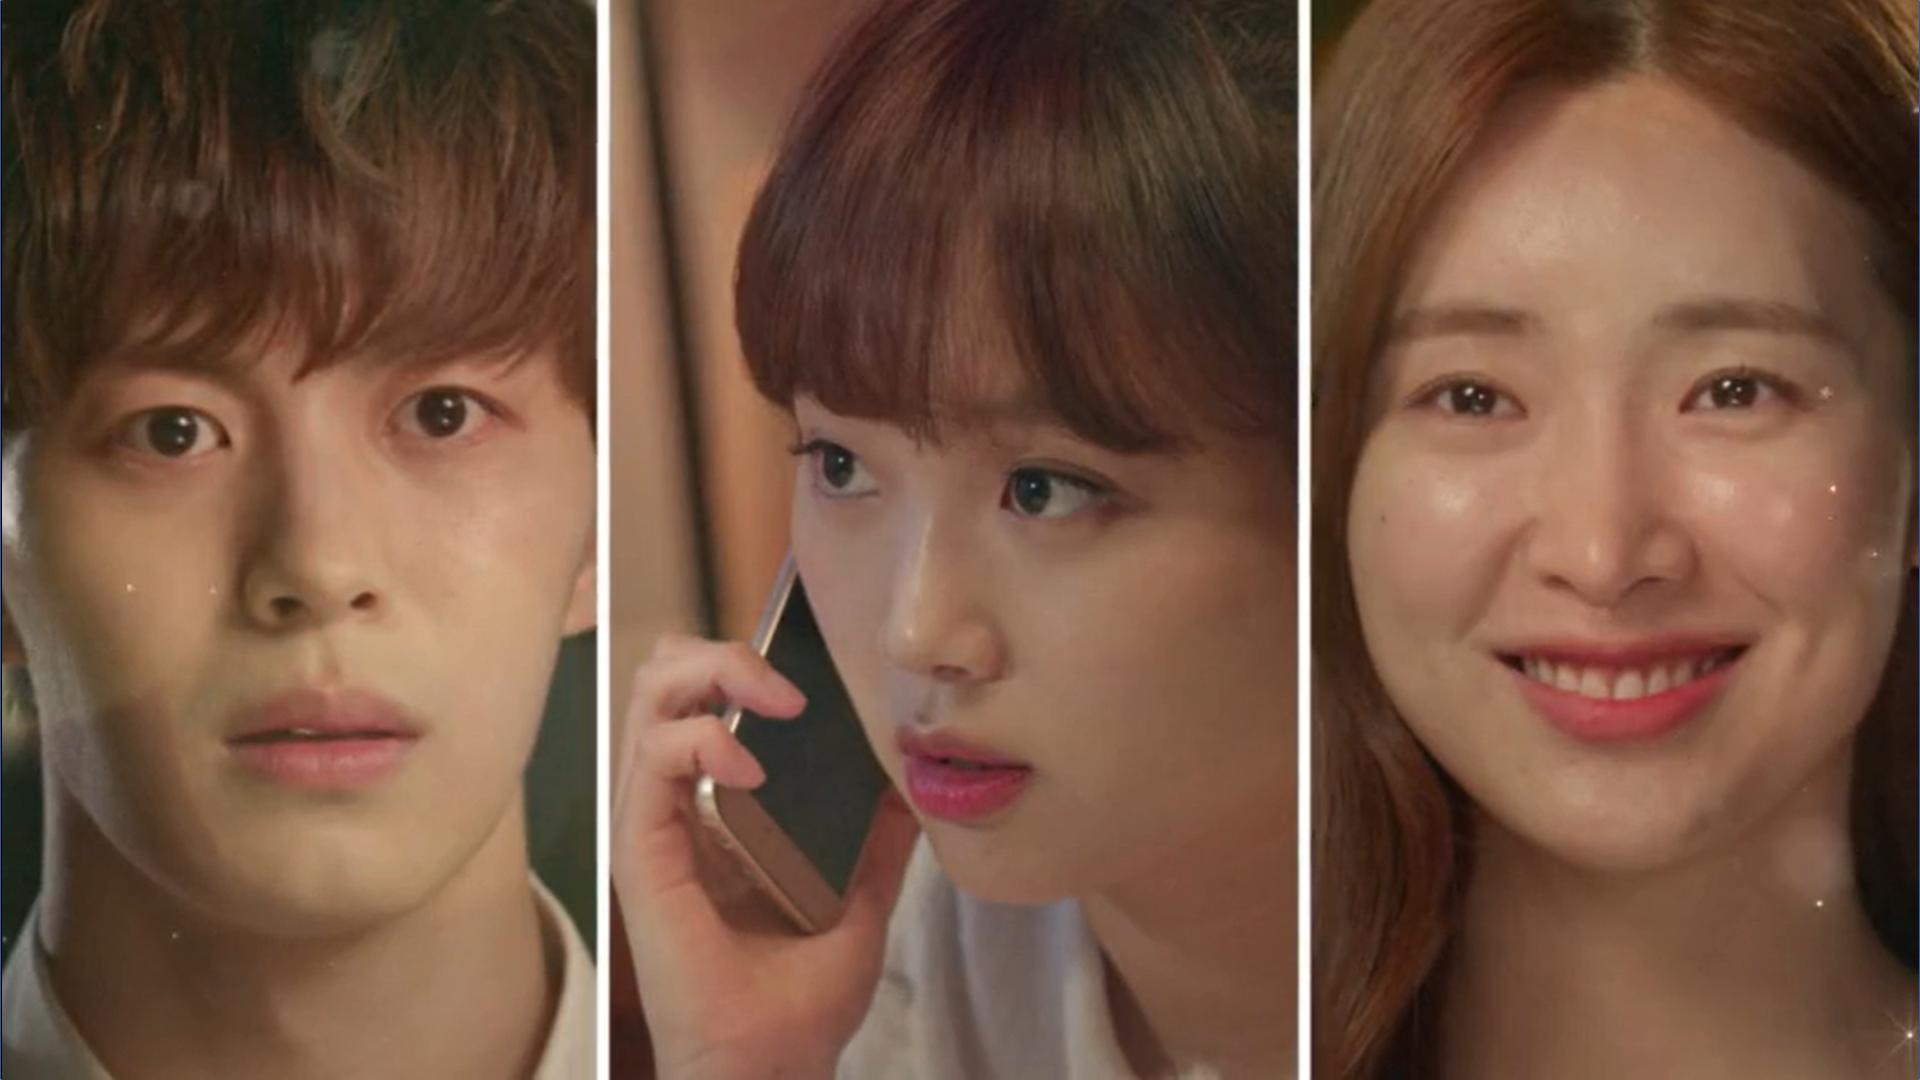 Wednesday 3:30 PM Yoon Jae-won, Seon Eun-woo, and Gong Na-yeon